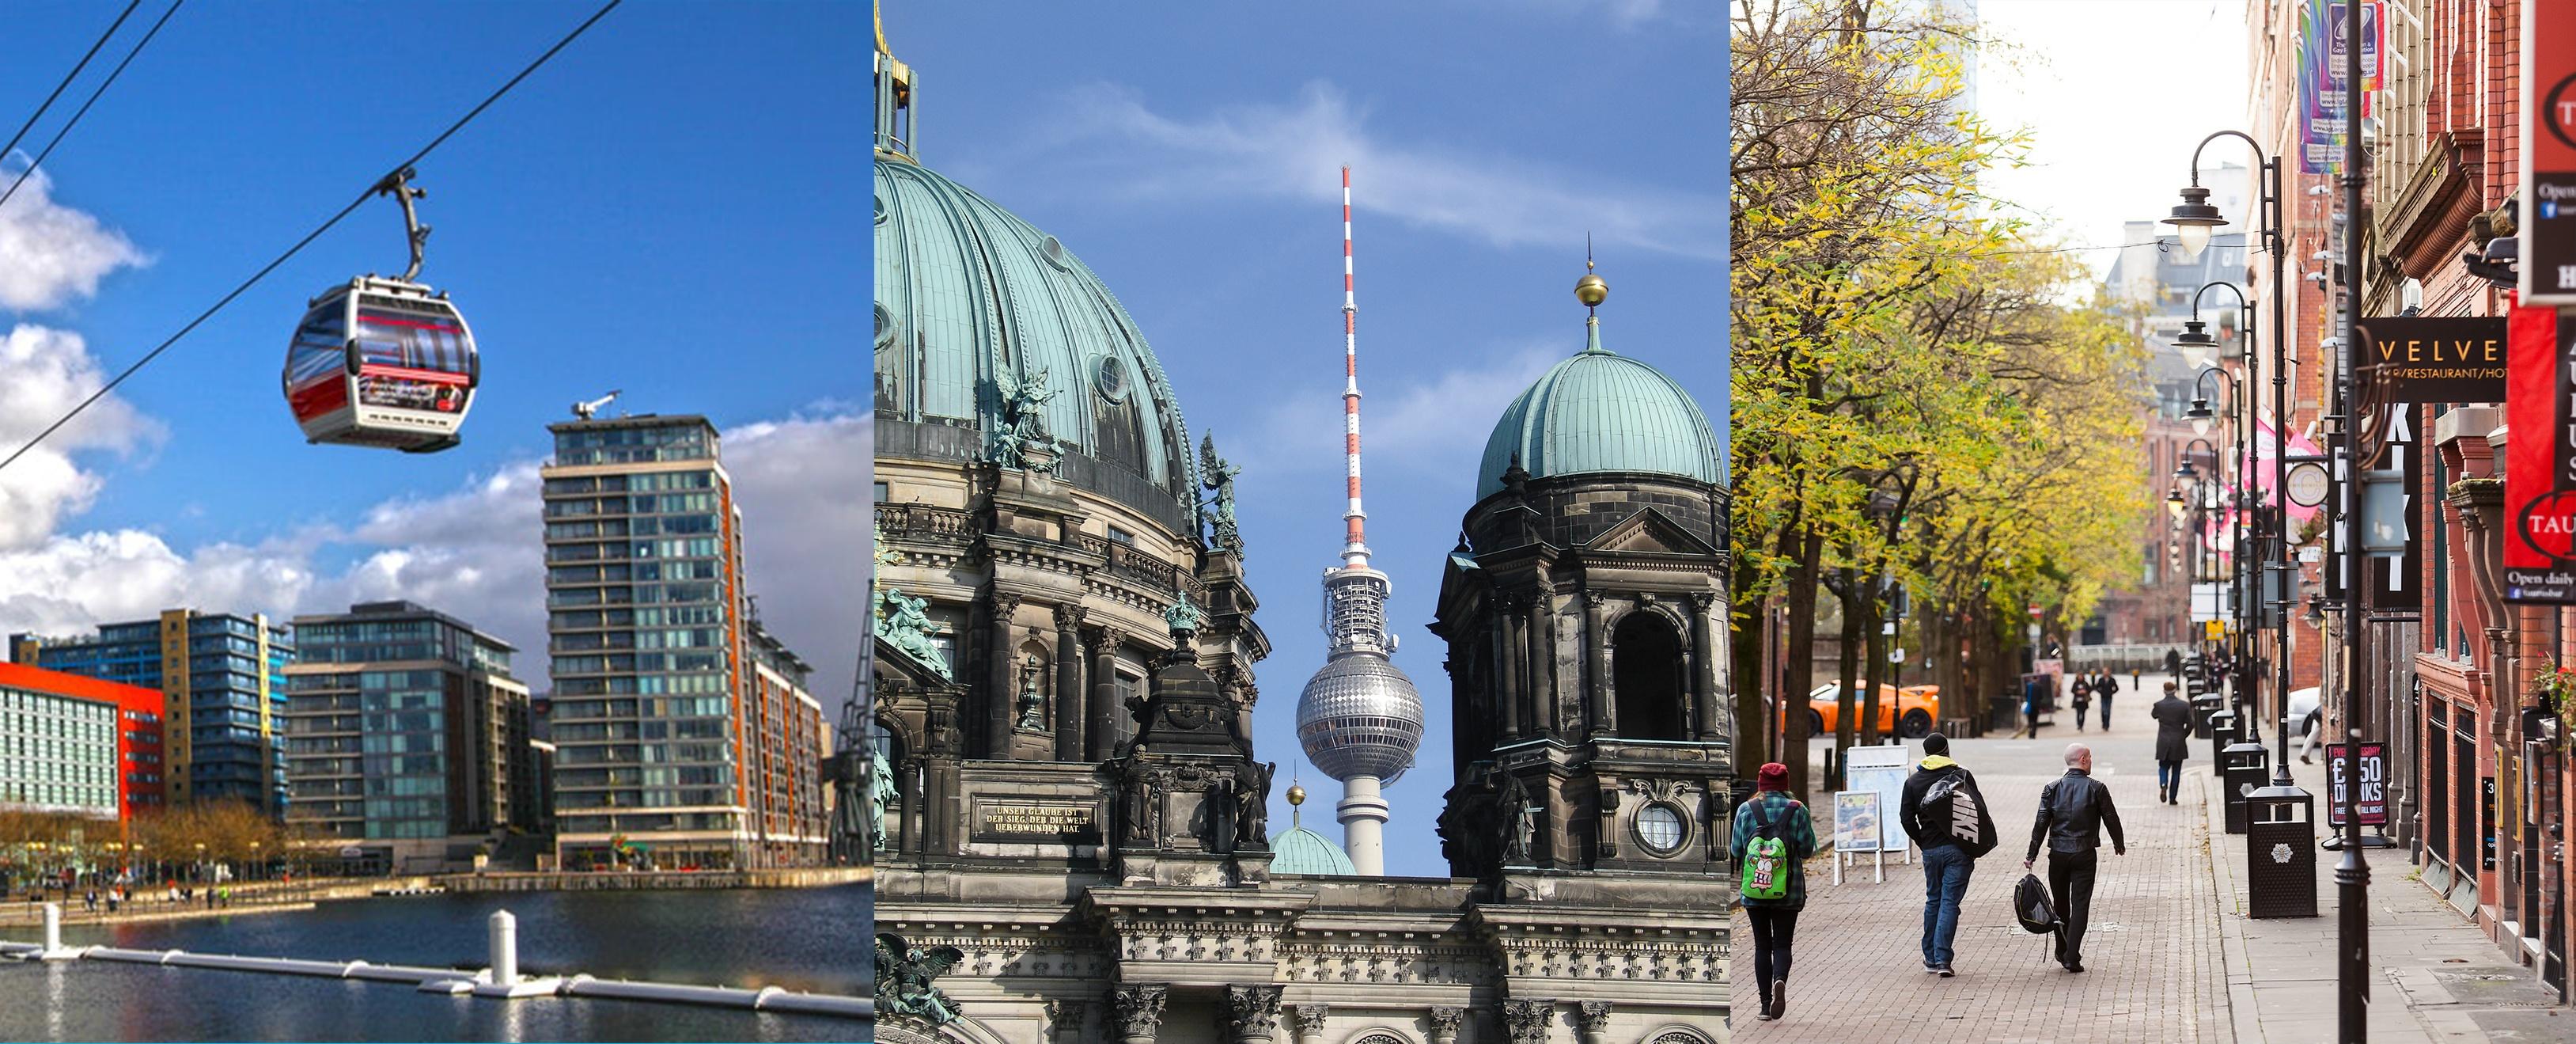 royaldocks-berlin-manchester.jpg